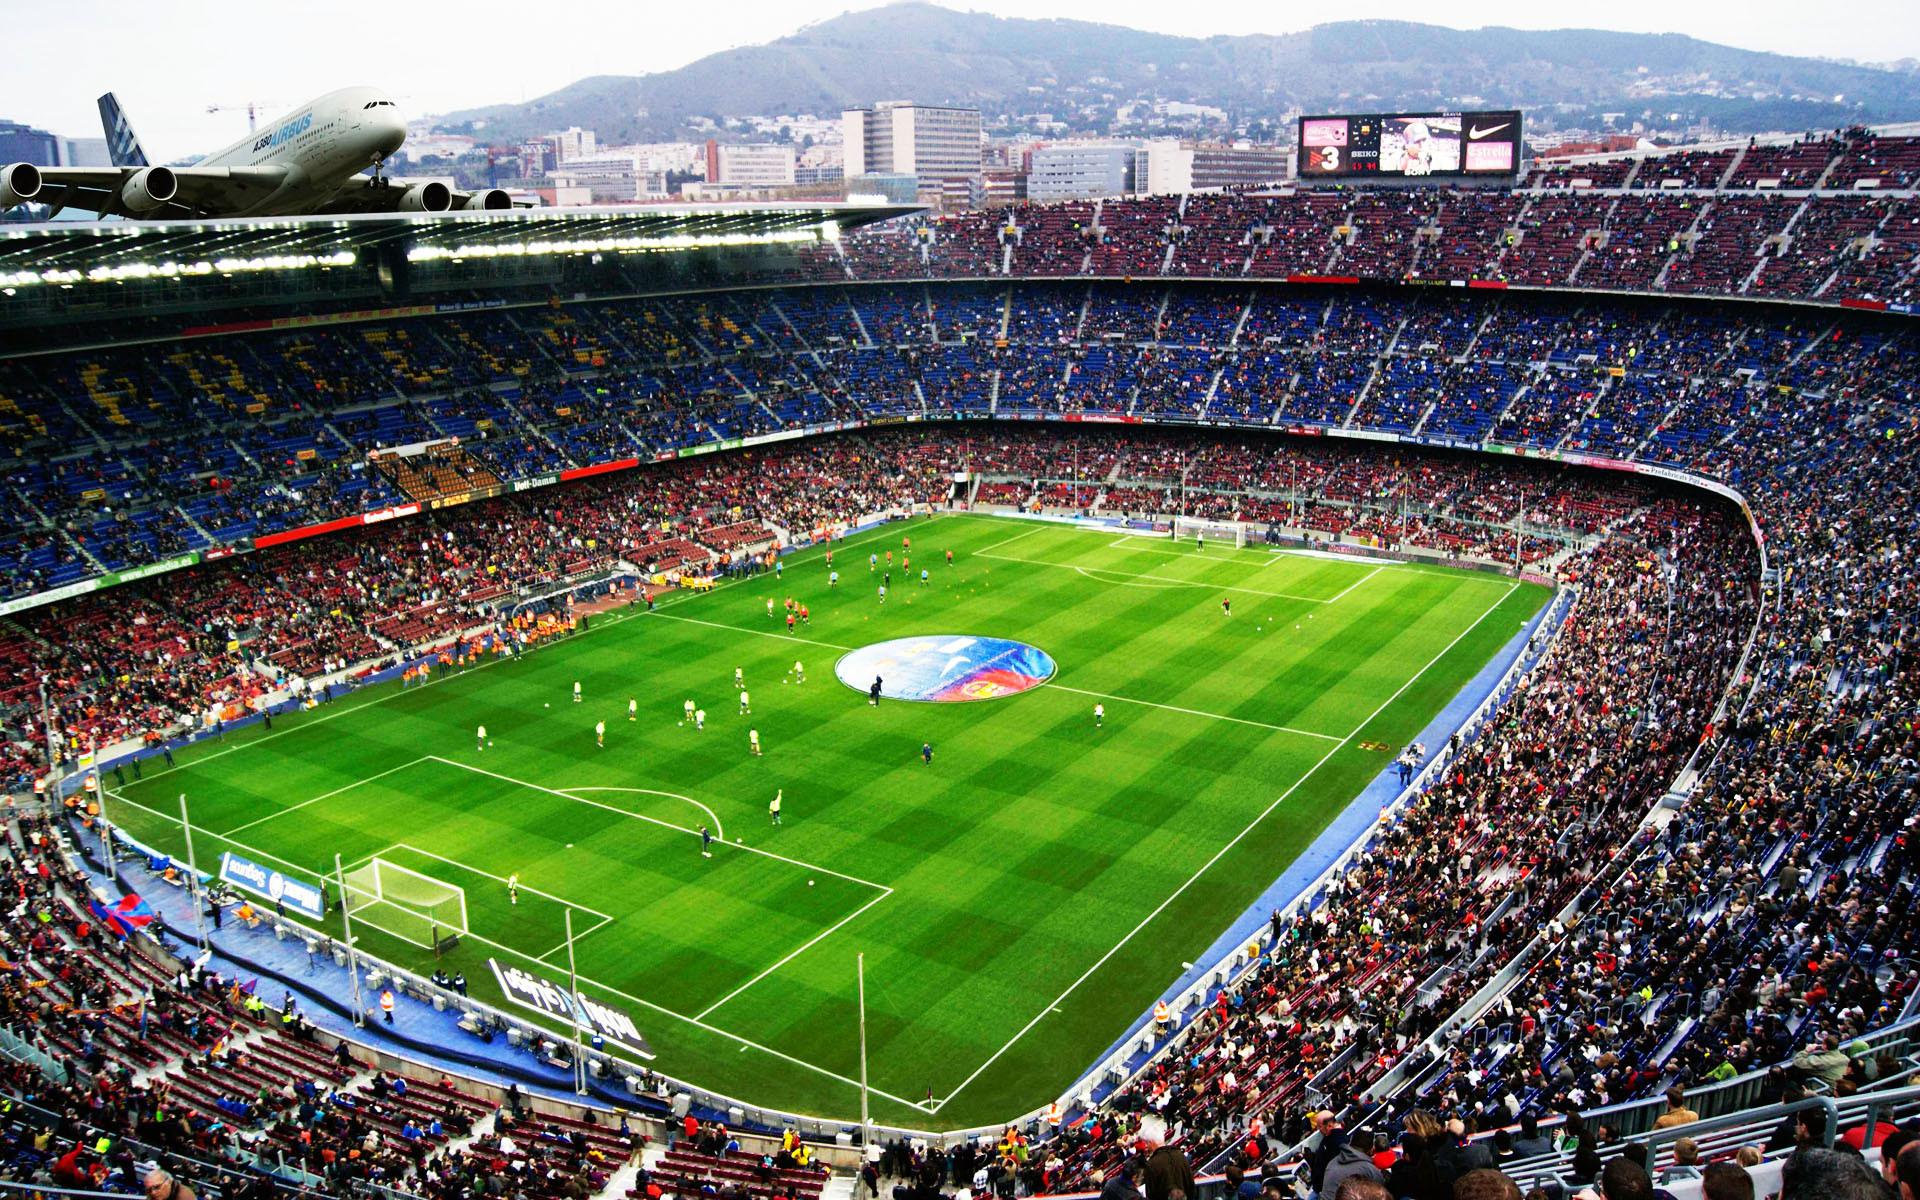 Res: 1920x1200, Football stadium